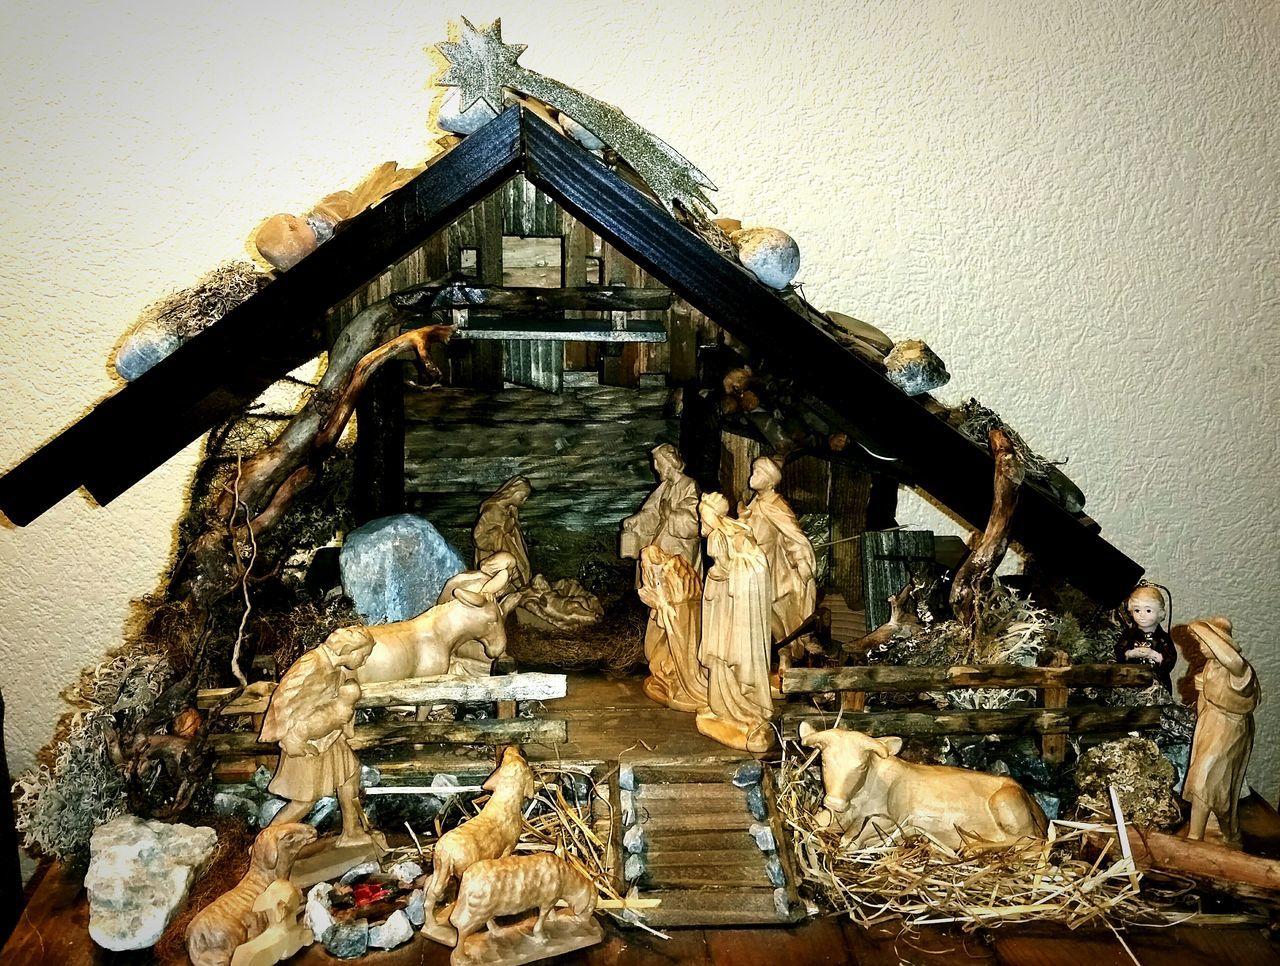 Christmas Around The World - wood carved Nativity Scene Christmas Decorations Handmade Wood Carving Traditions Weihnachtskrippe Taking Photos Tadaa Festive Season